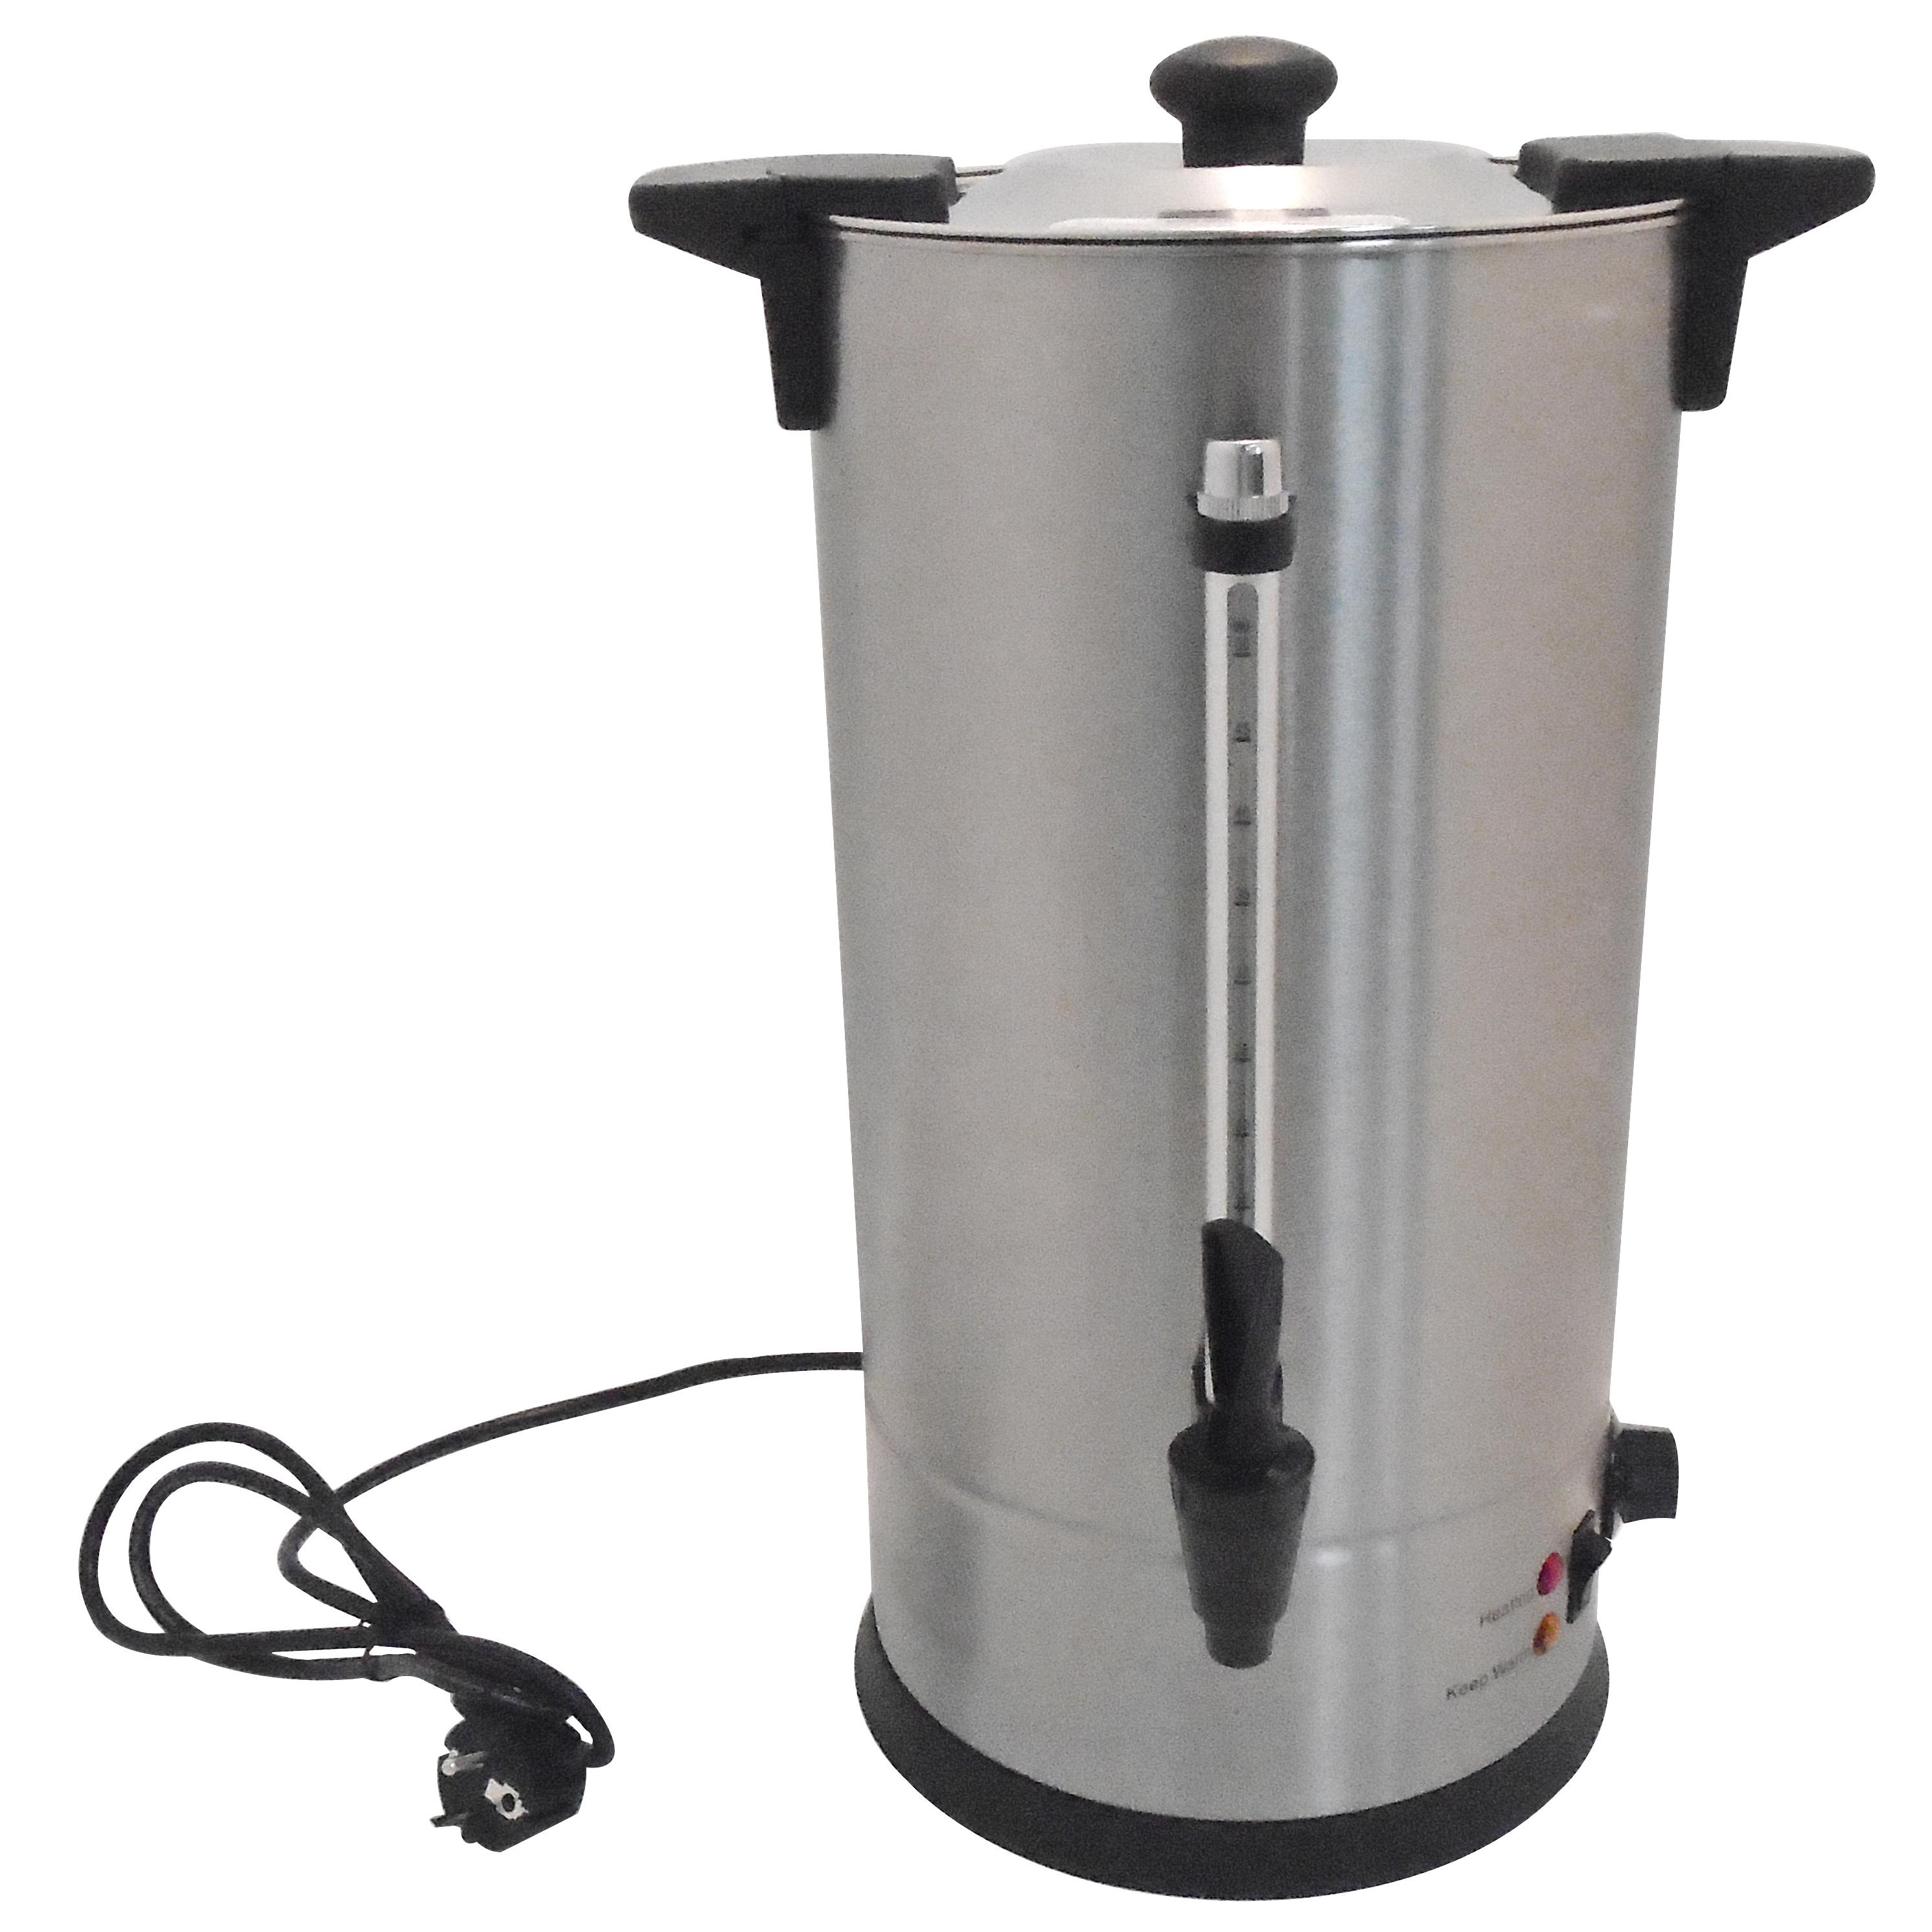 ENC-88DR Μηχανές Καφέ Φίλτρου - Βραστήρας Καφέ Φίλτρου Percolator & Βραστήρας Νε επαγγελματικός εξοπλισμός   μηχανές καφέ   συσκευές για bar   percolator   βραστ